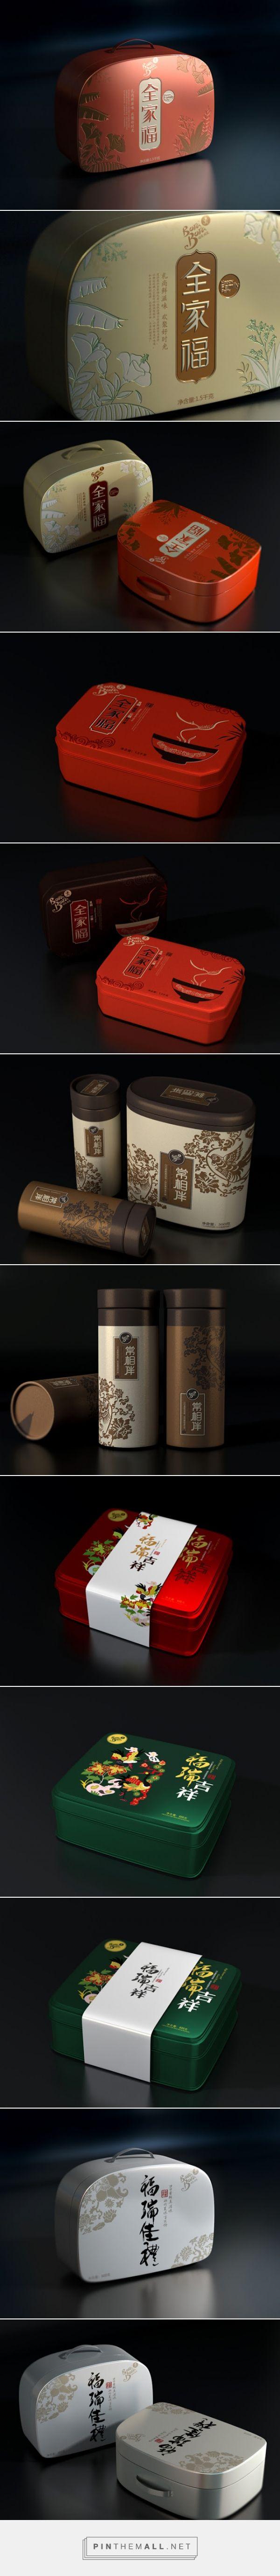 Bora Bora #Foods #packaging by Aurea Design - http://www.packagingoftheworld.com/2015/01/bora-bora-foods.html